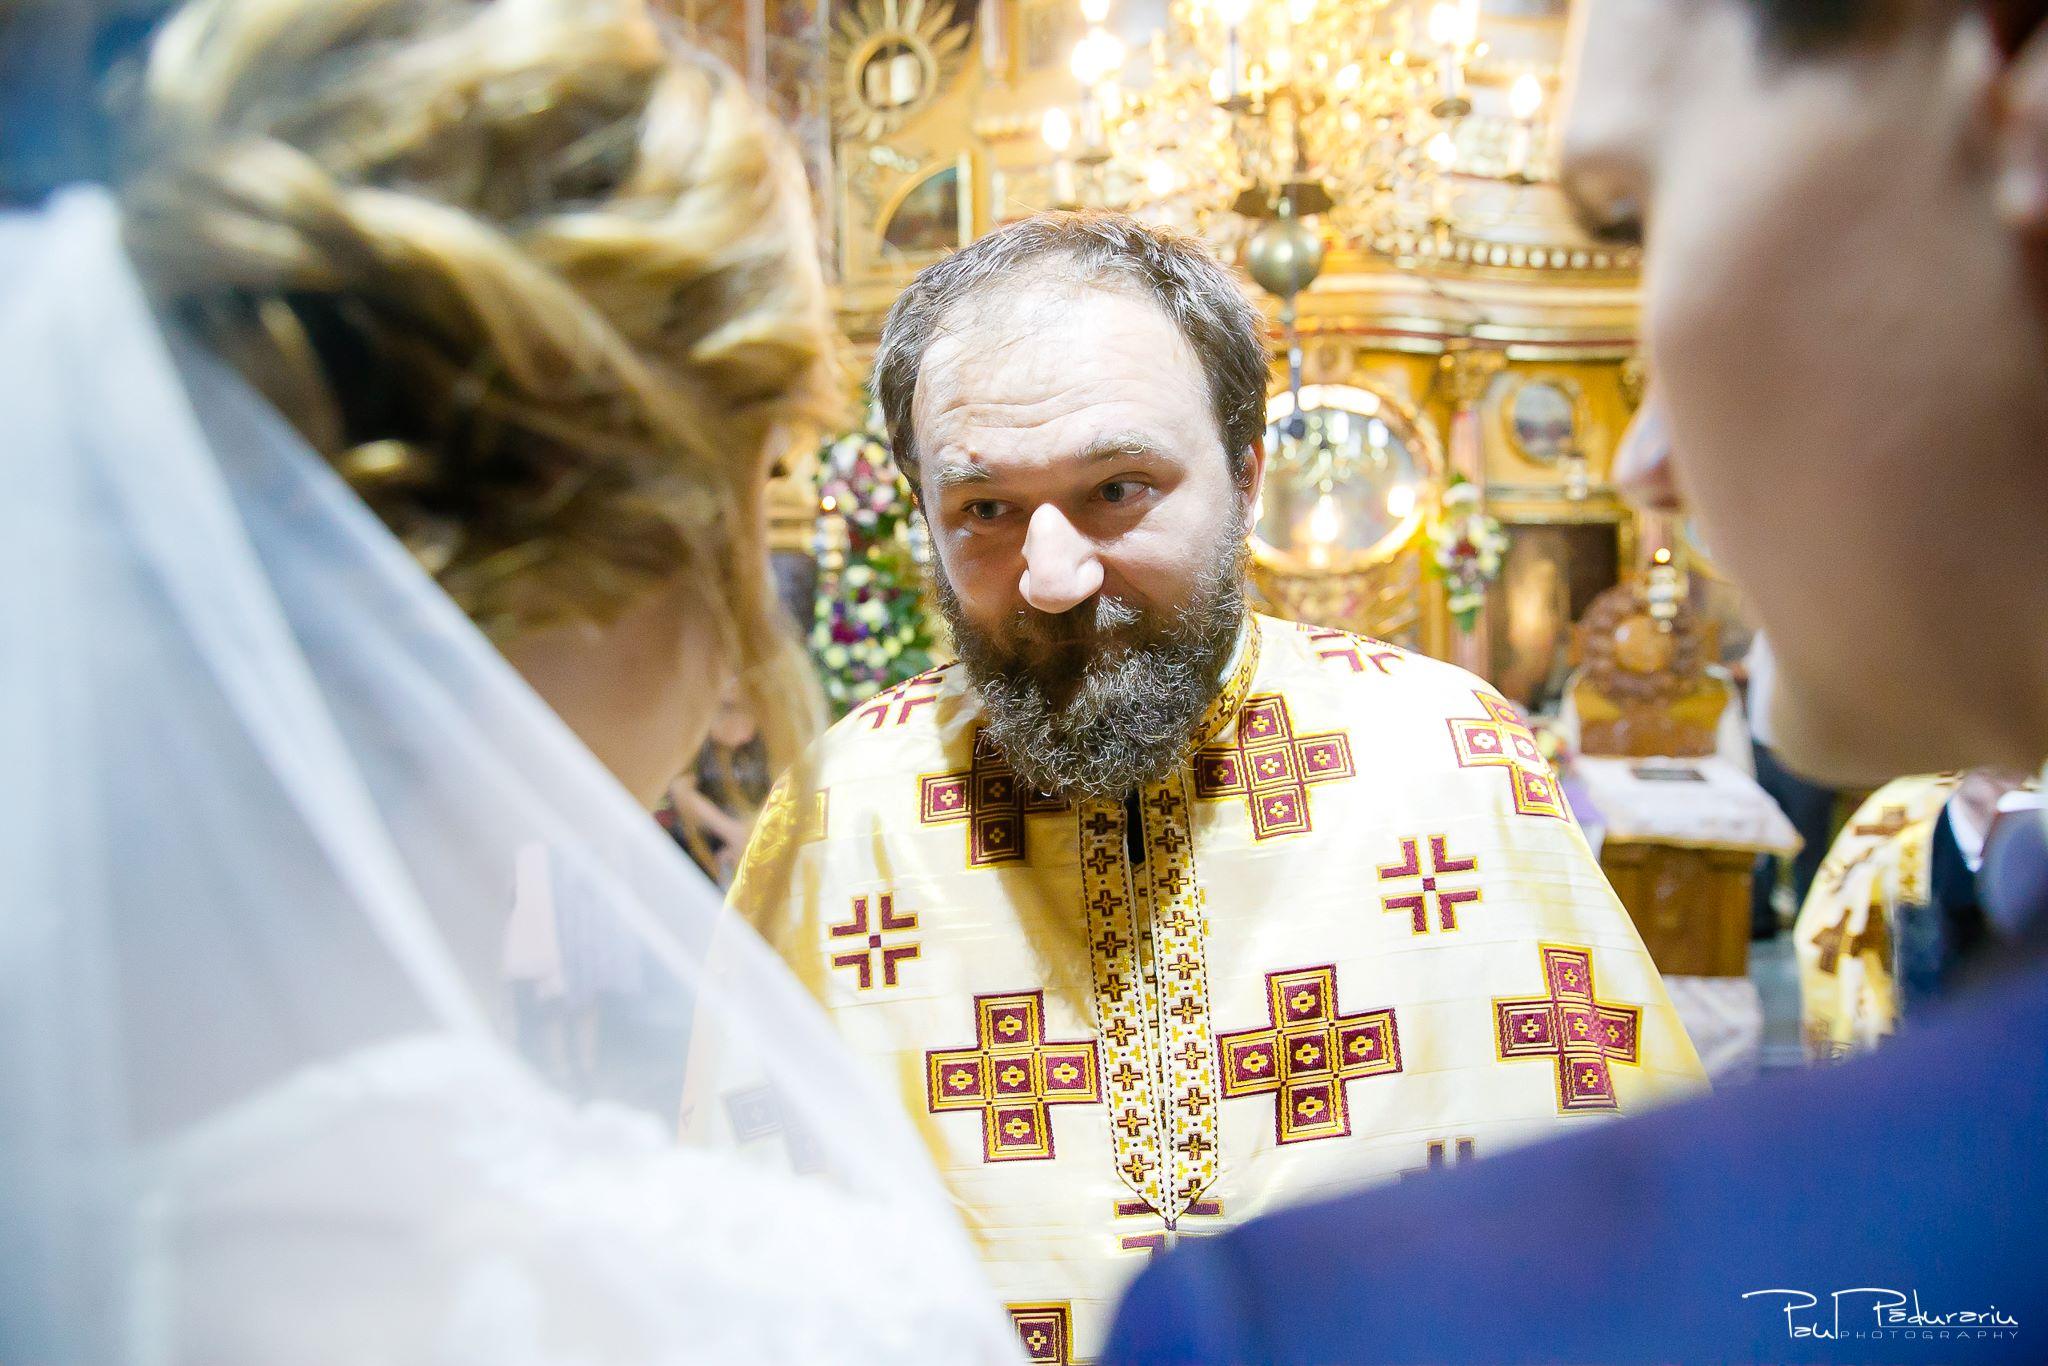 Nicoleta si Catalin fotografie nunta Iasi Biserica Rotunda Letcani fotograf nunta Iasi paul padurariu 2018 11